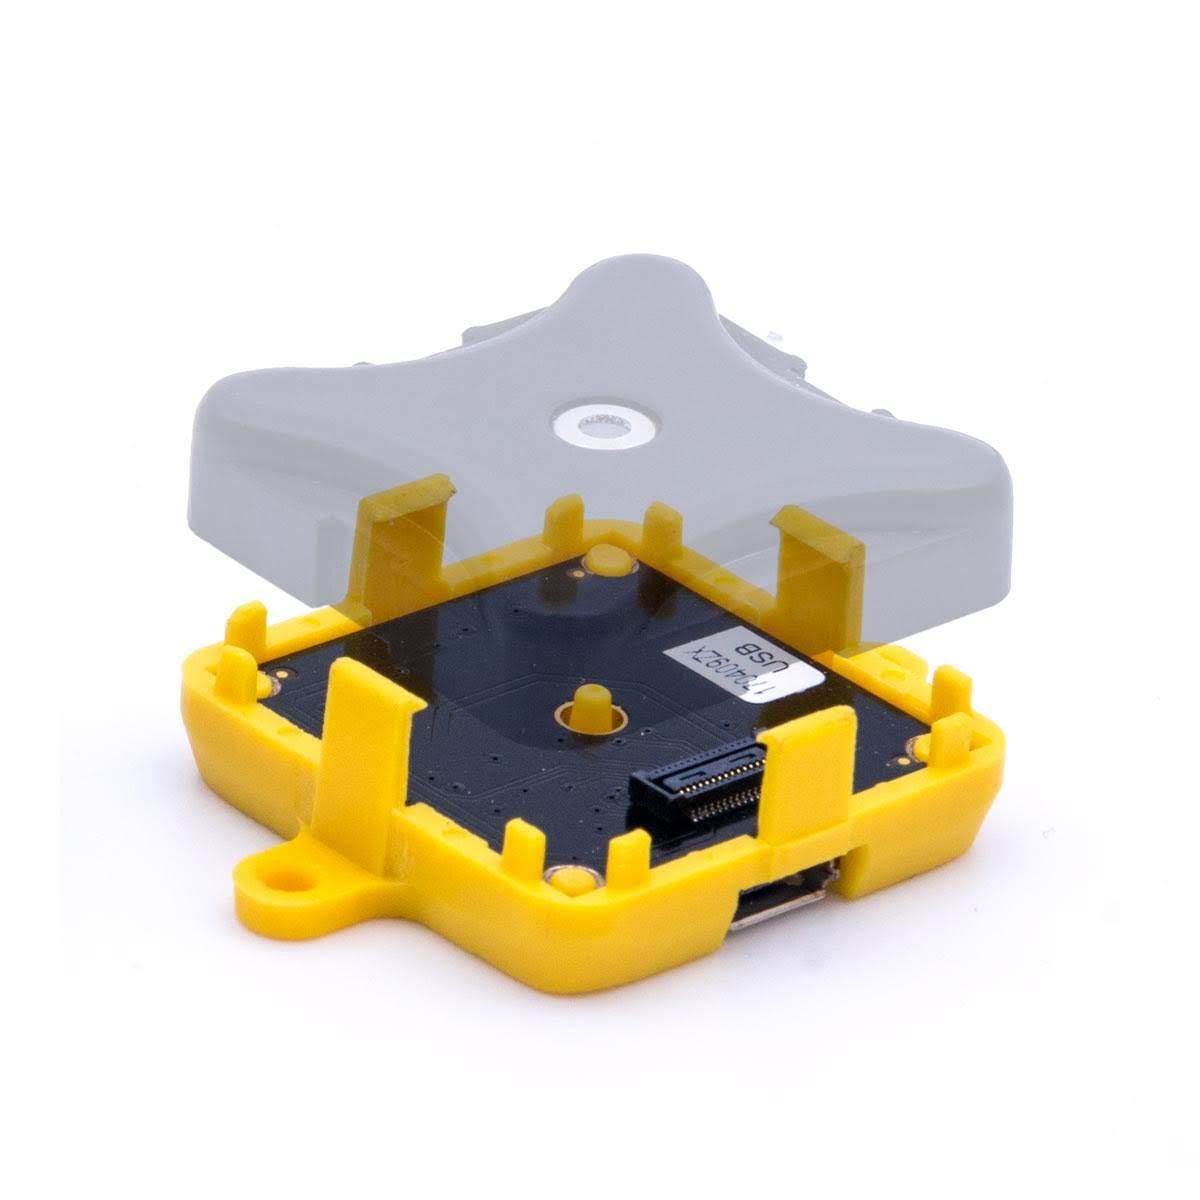 Teraranger Evo Thermal 90 Ir Optical Sensor